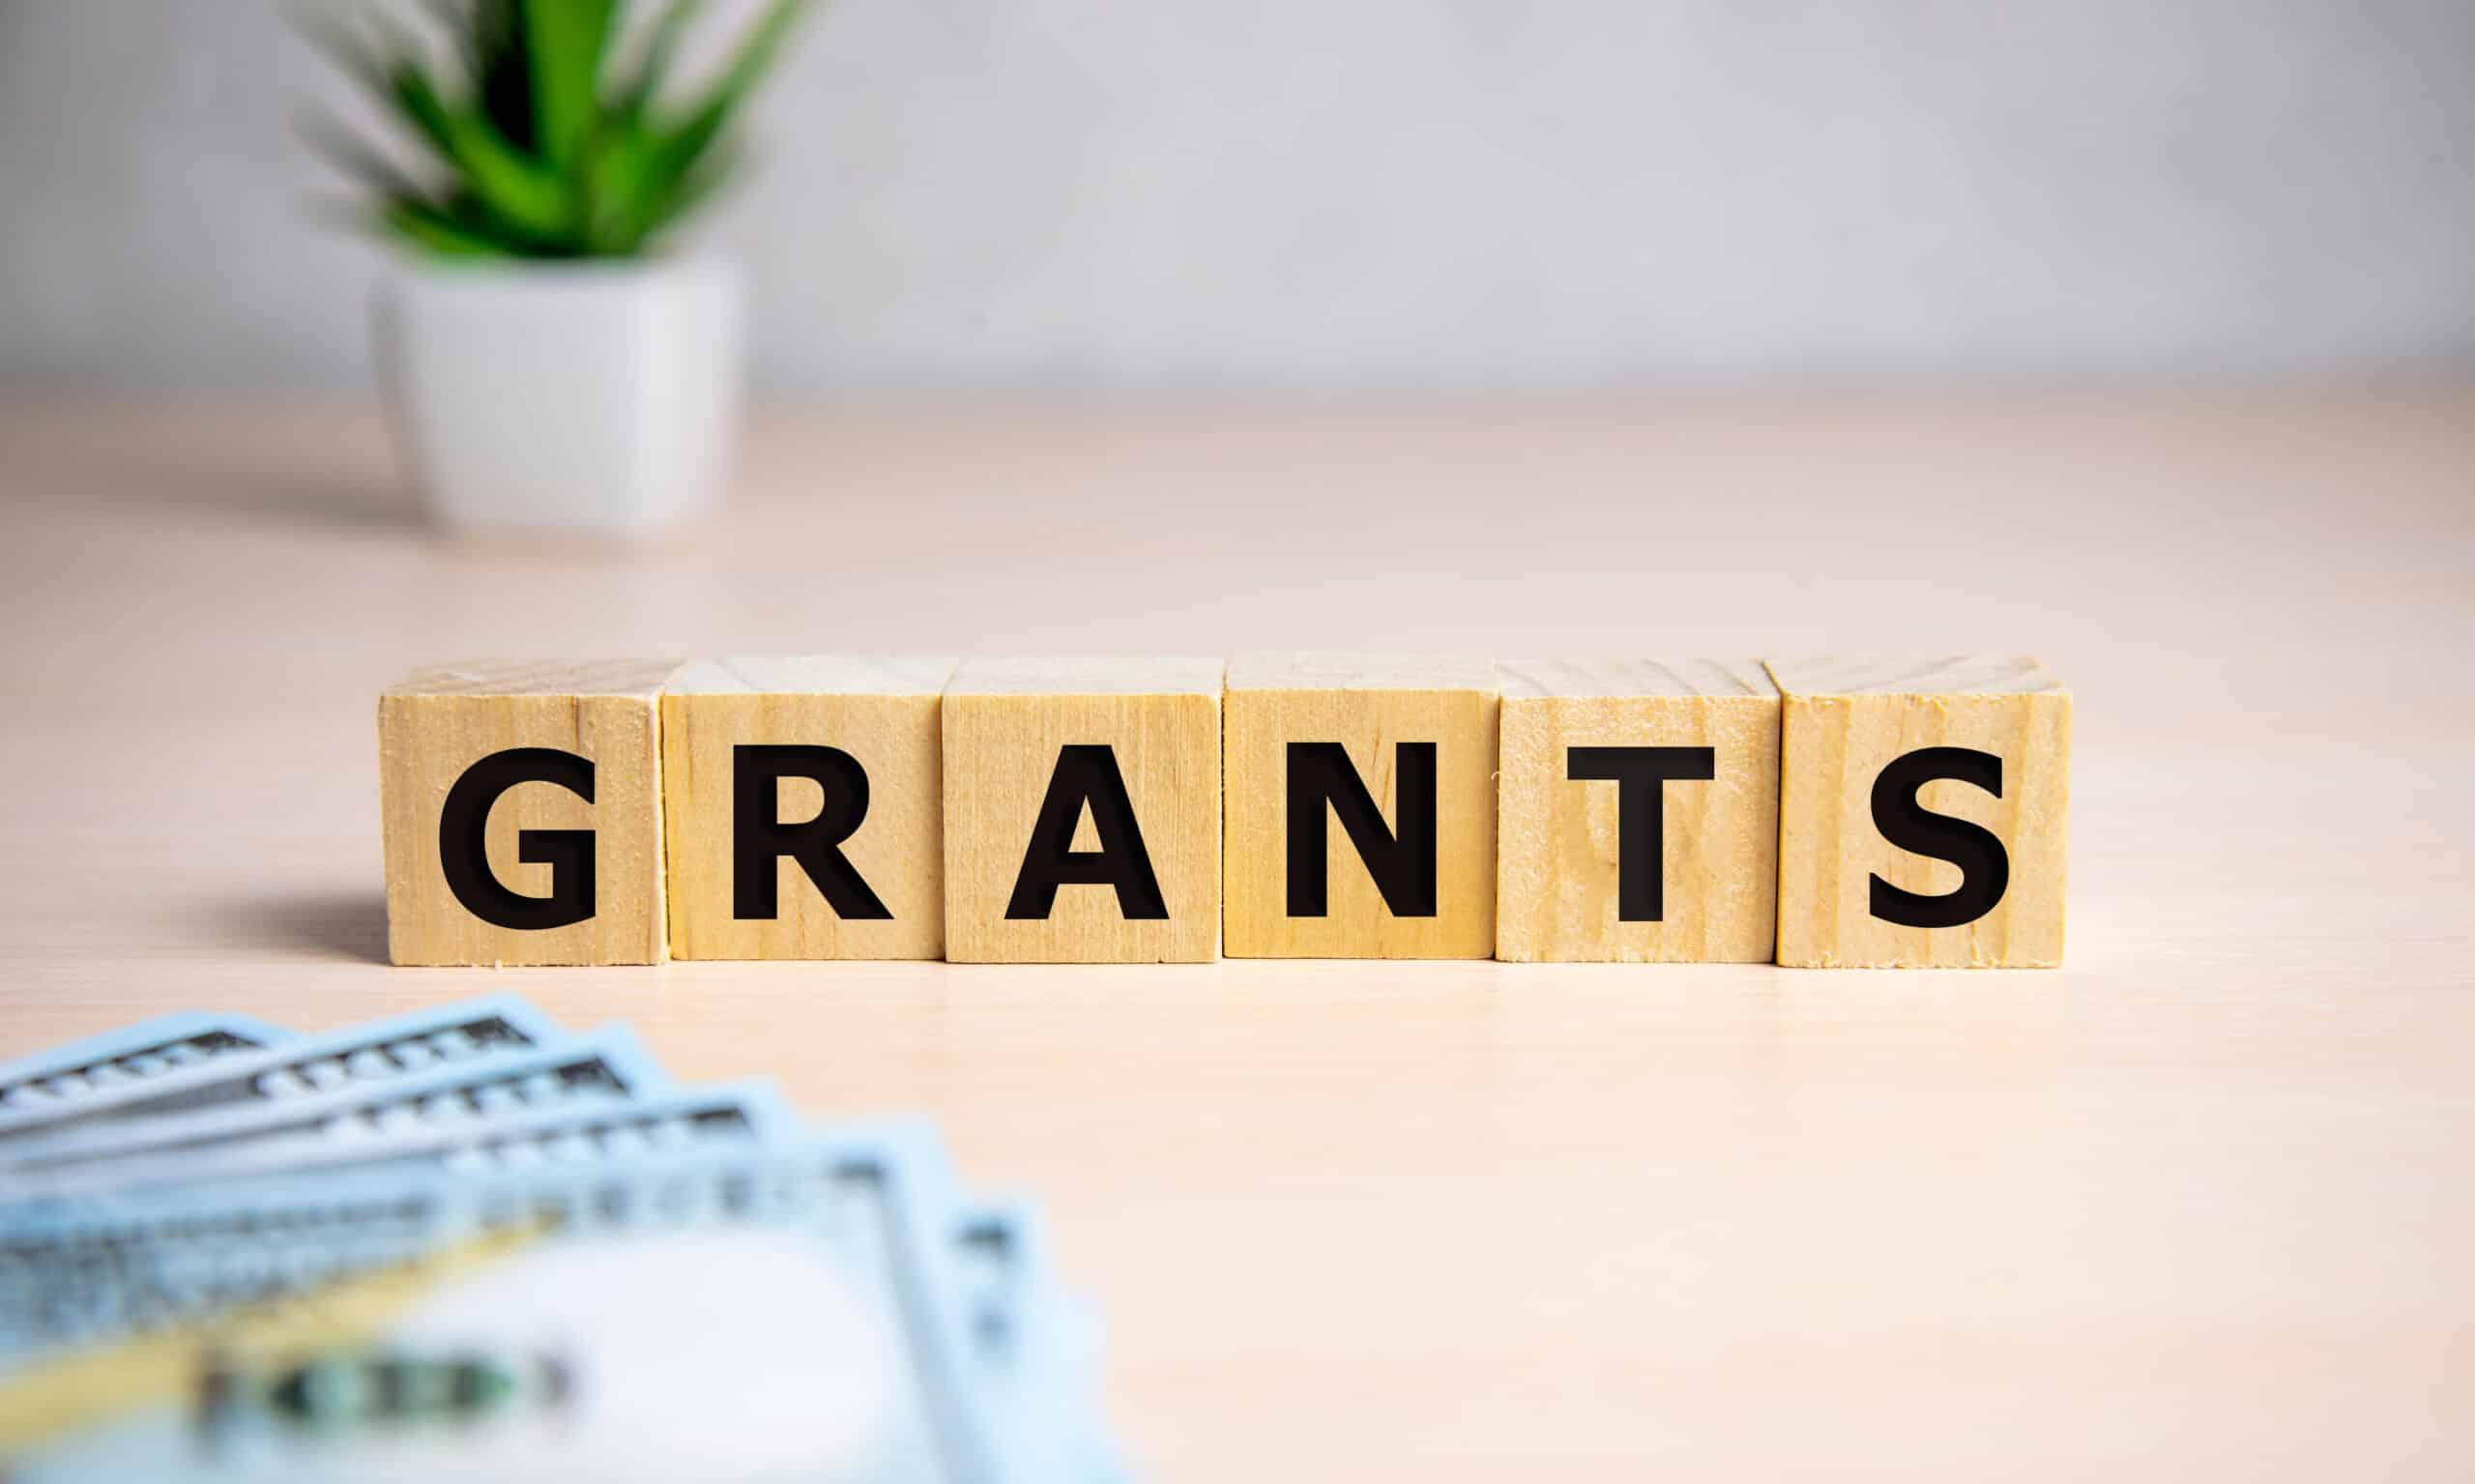 Back to Business Grant Program 2021